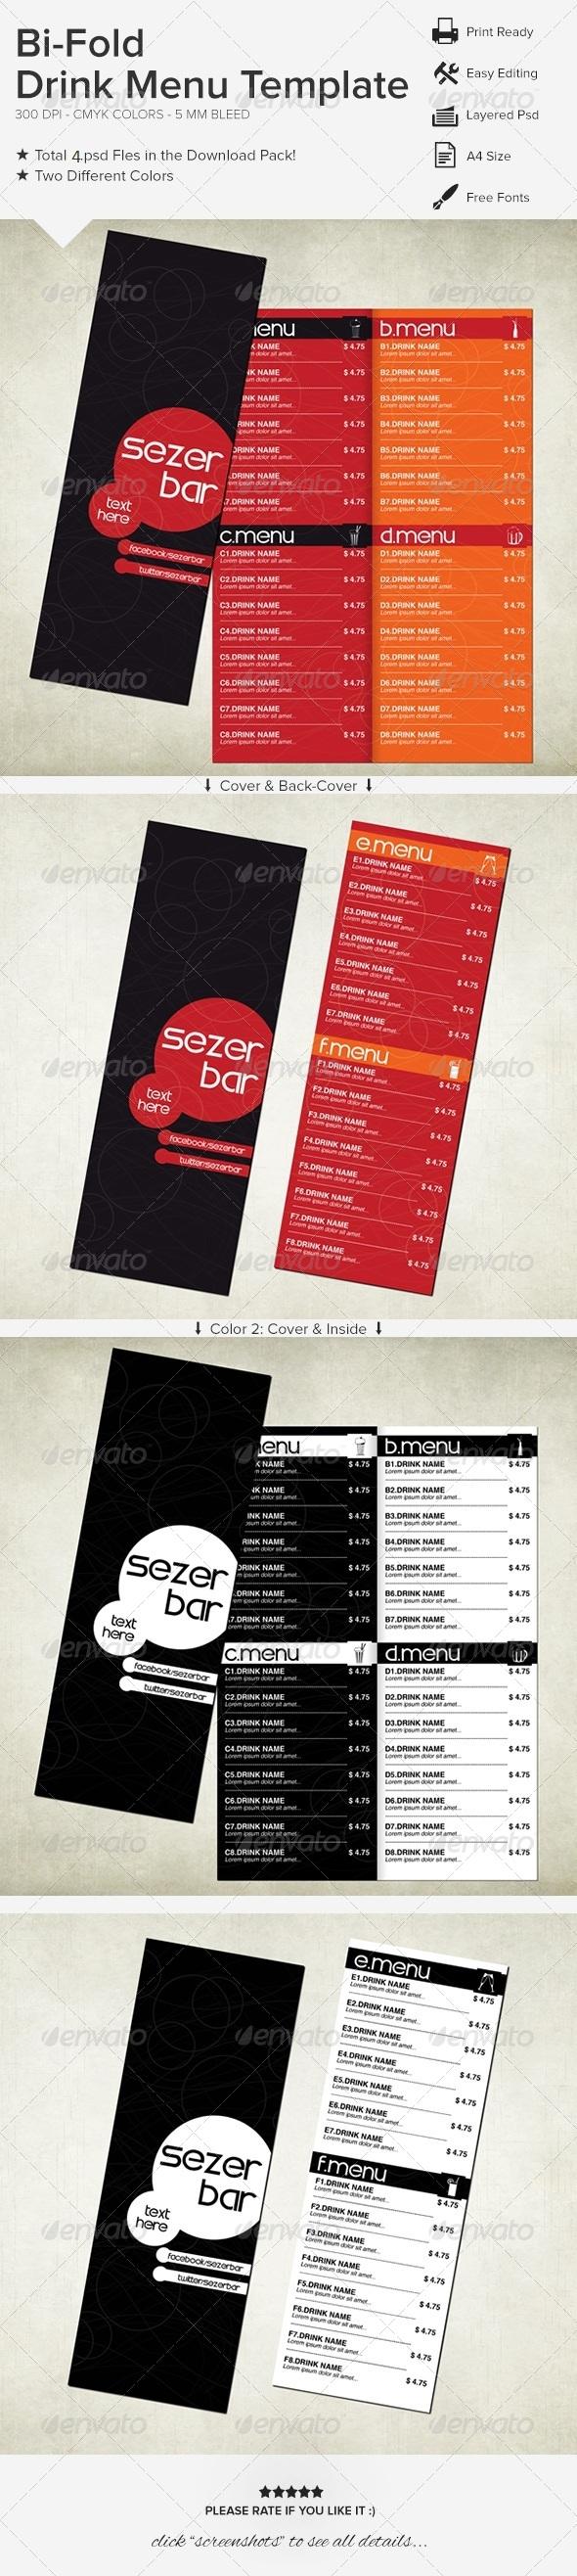 GraphicRiver Bi-Fold Drink Menu Template 6264702